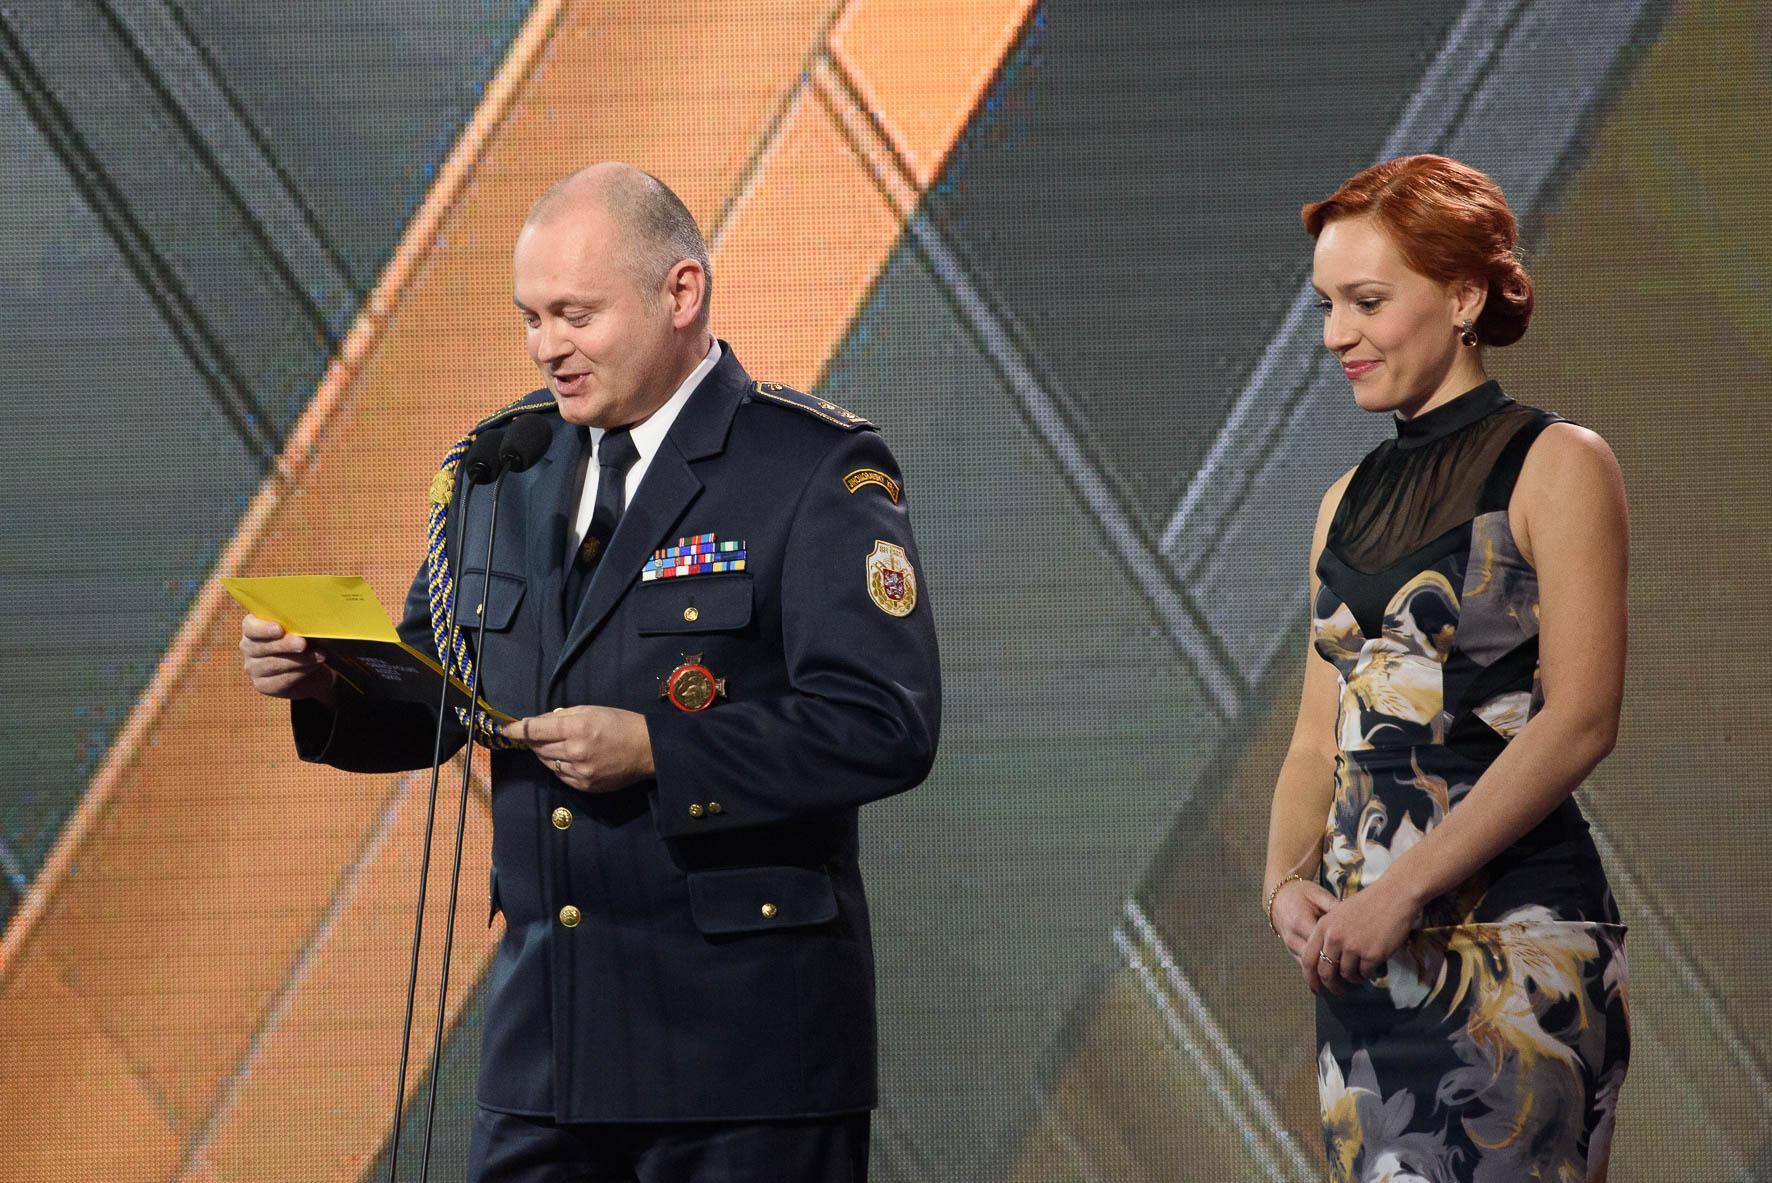 anketa-dobrovolni-hasici-roku-2015-vyhlaseni-vysledku-vyhlaseni-hejtman-jmk-mluvci-ceps